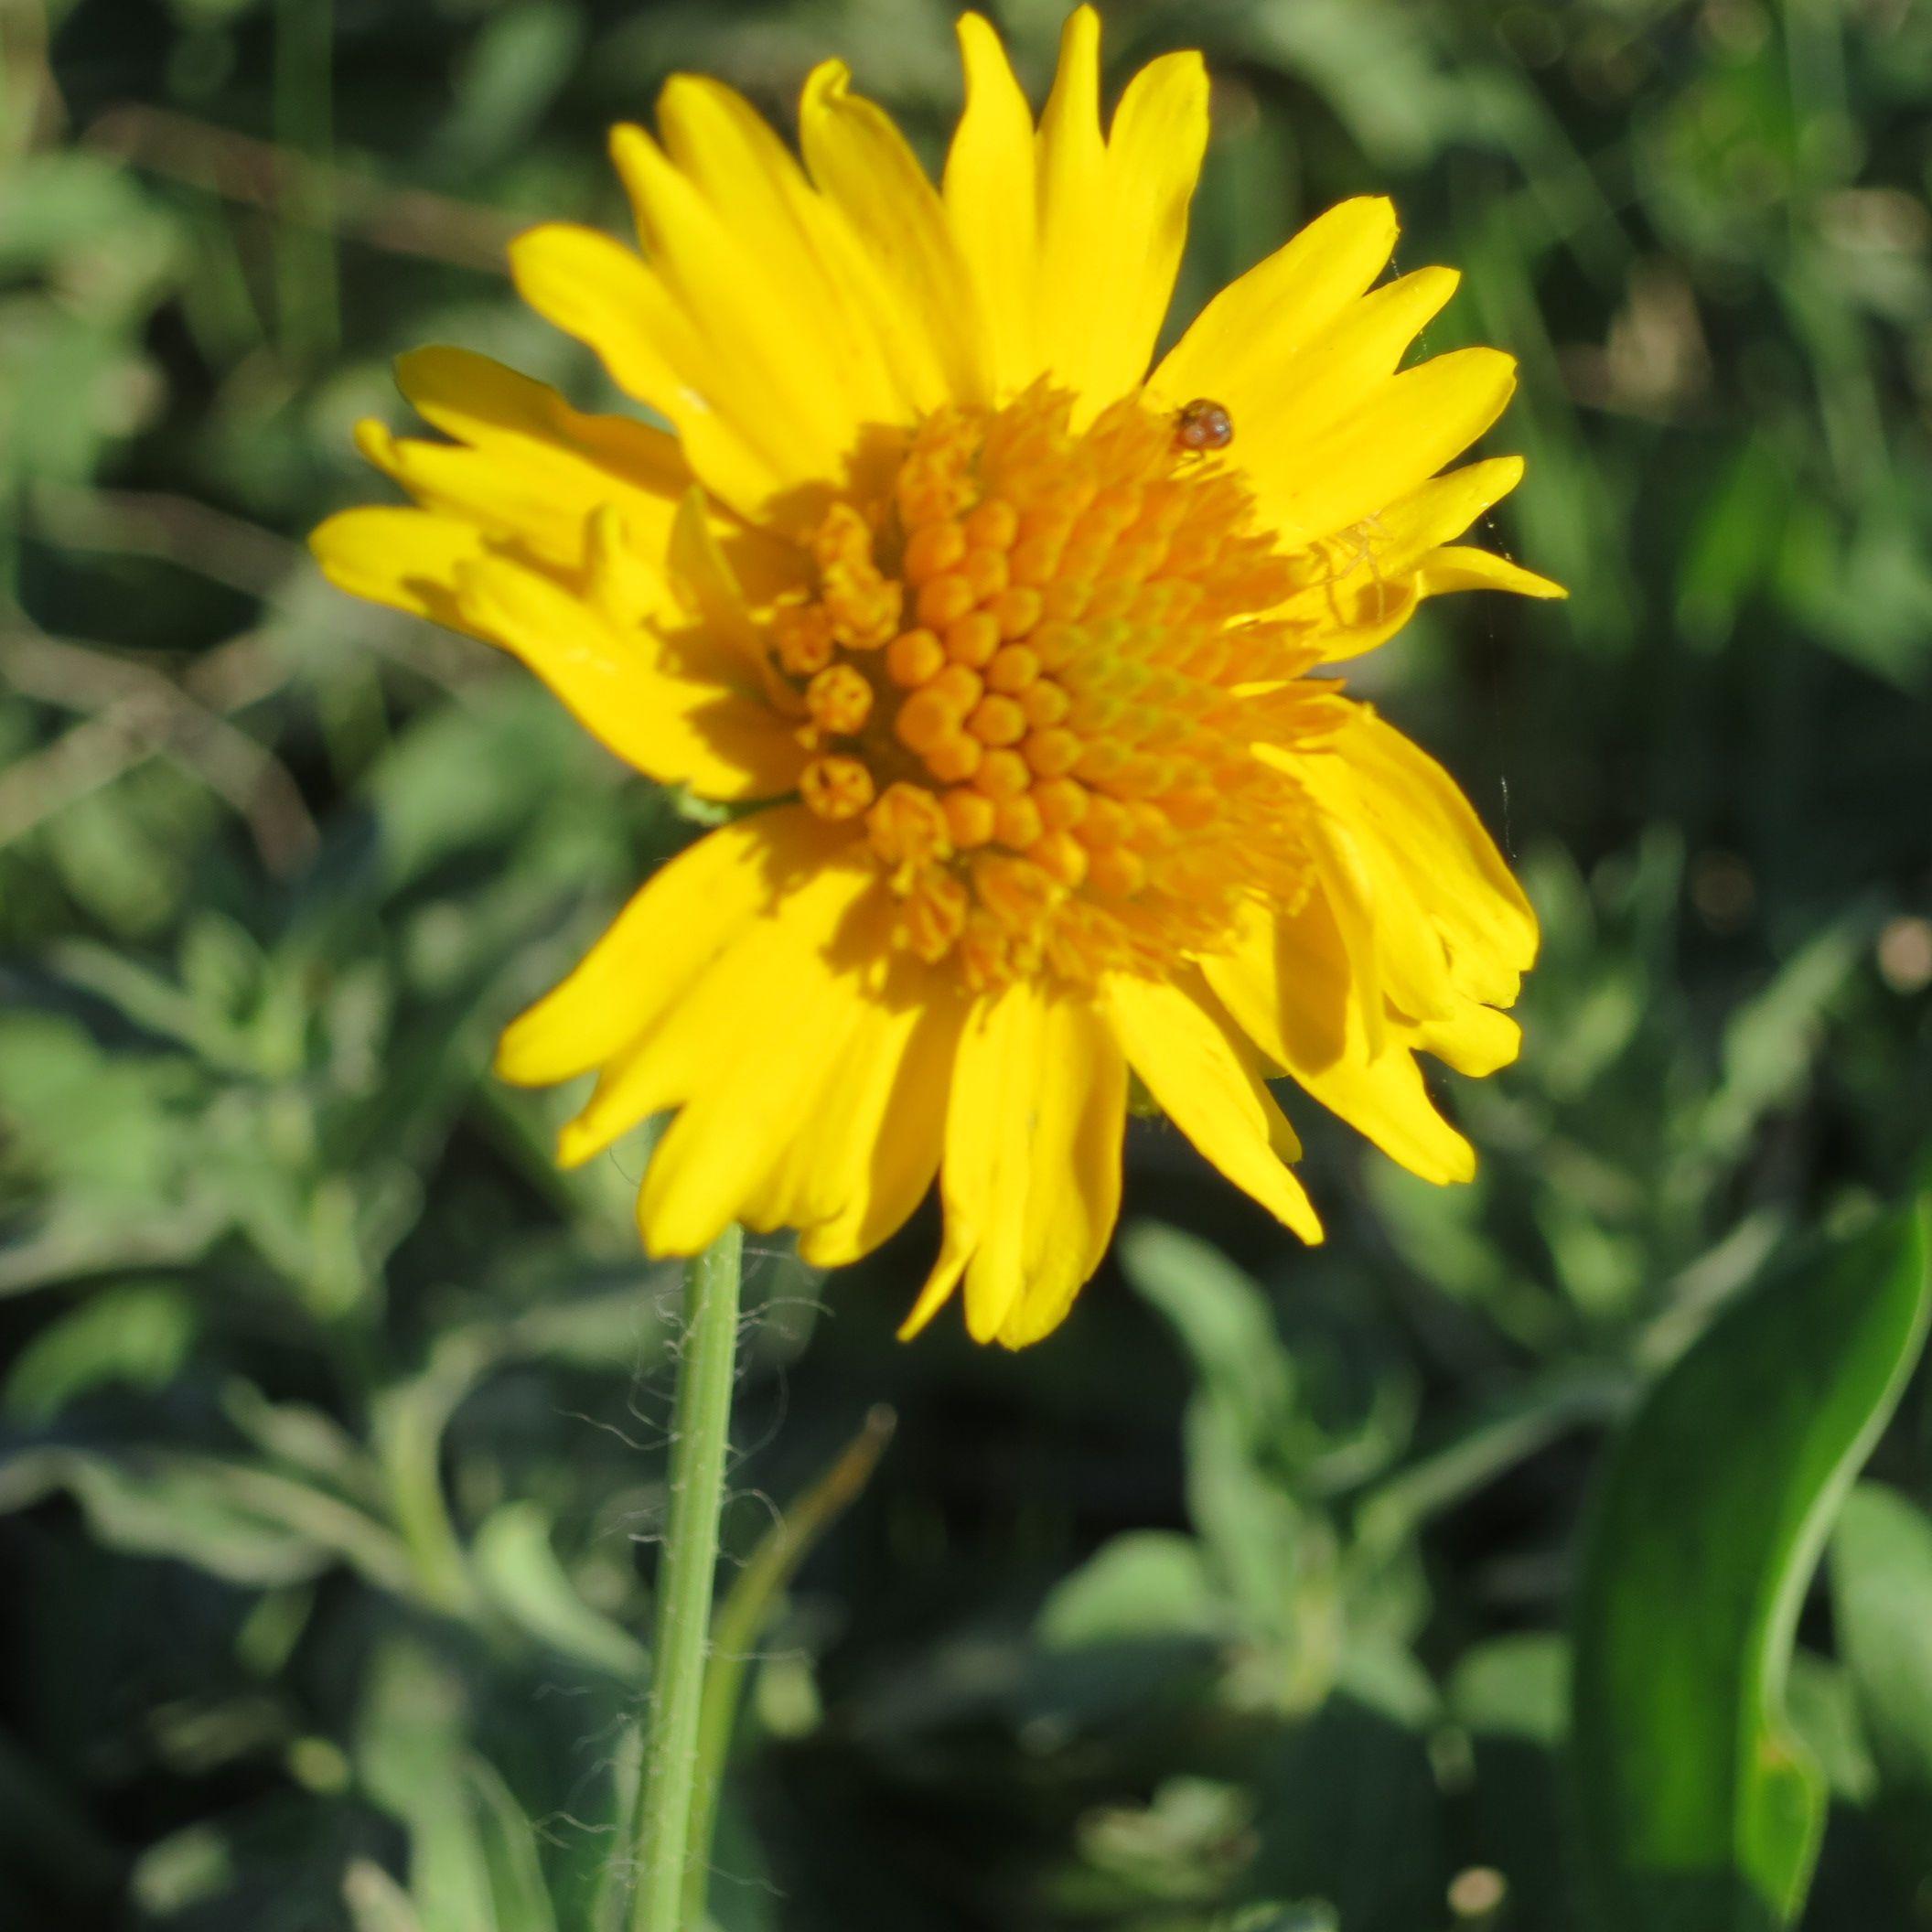 Texas wild flowers ruraltexasphotos Flower care, Wild